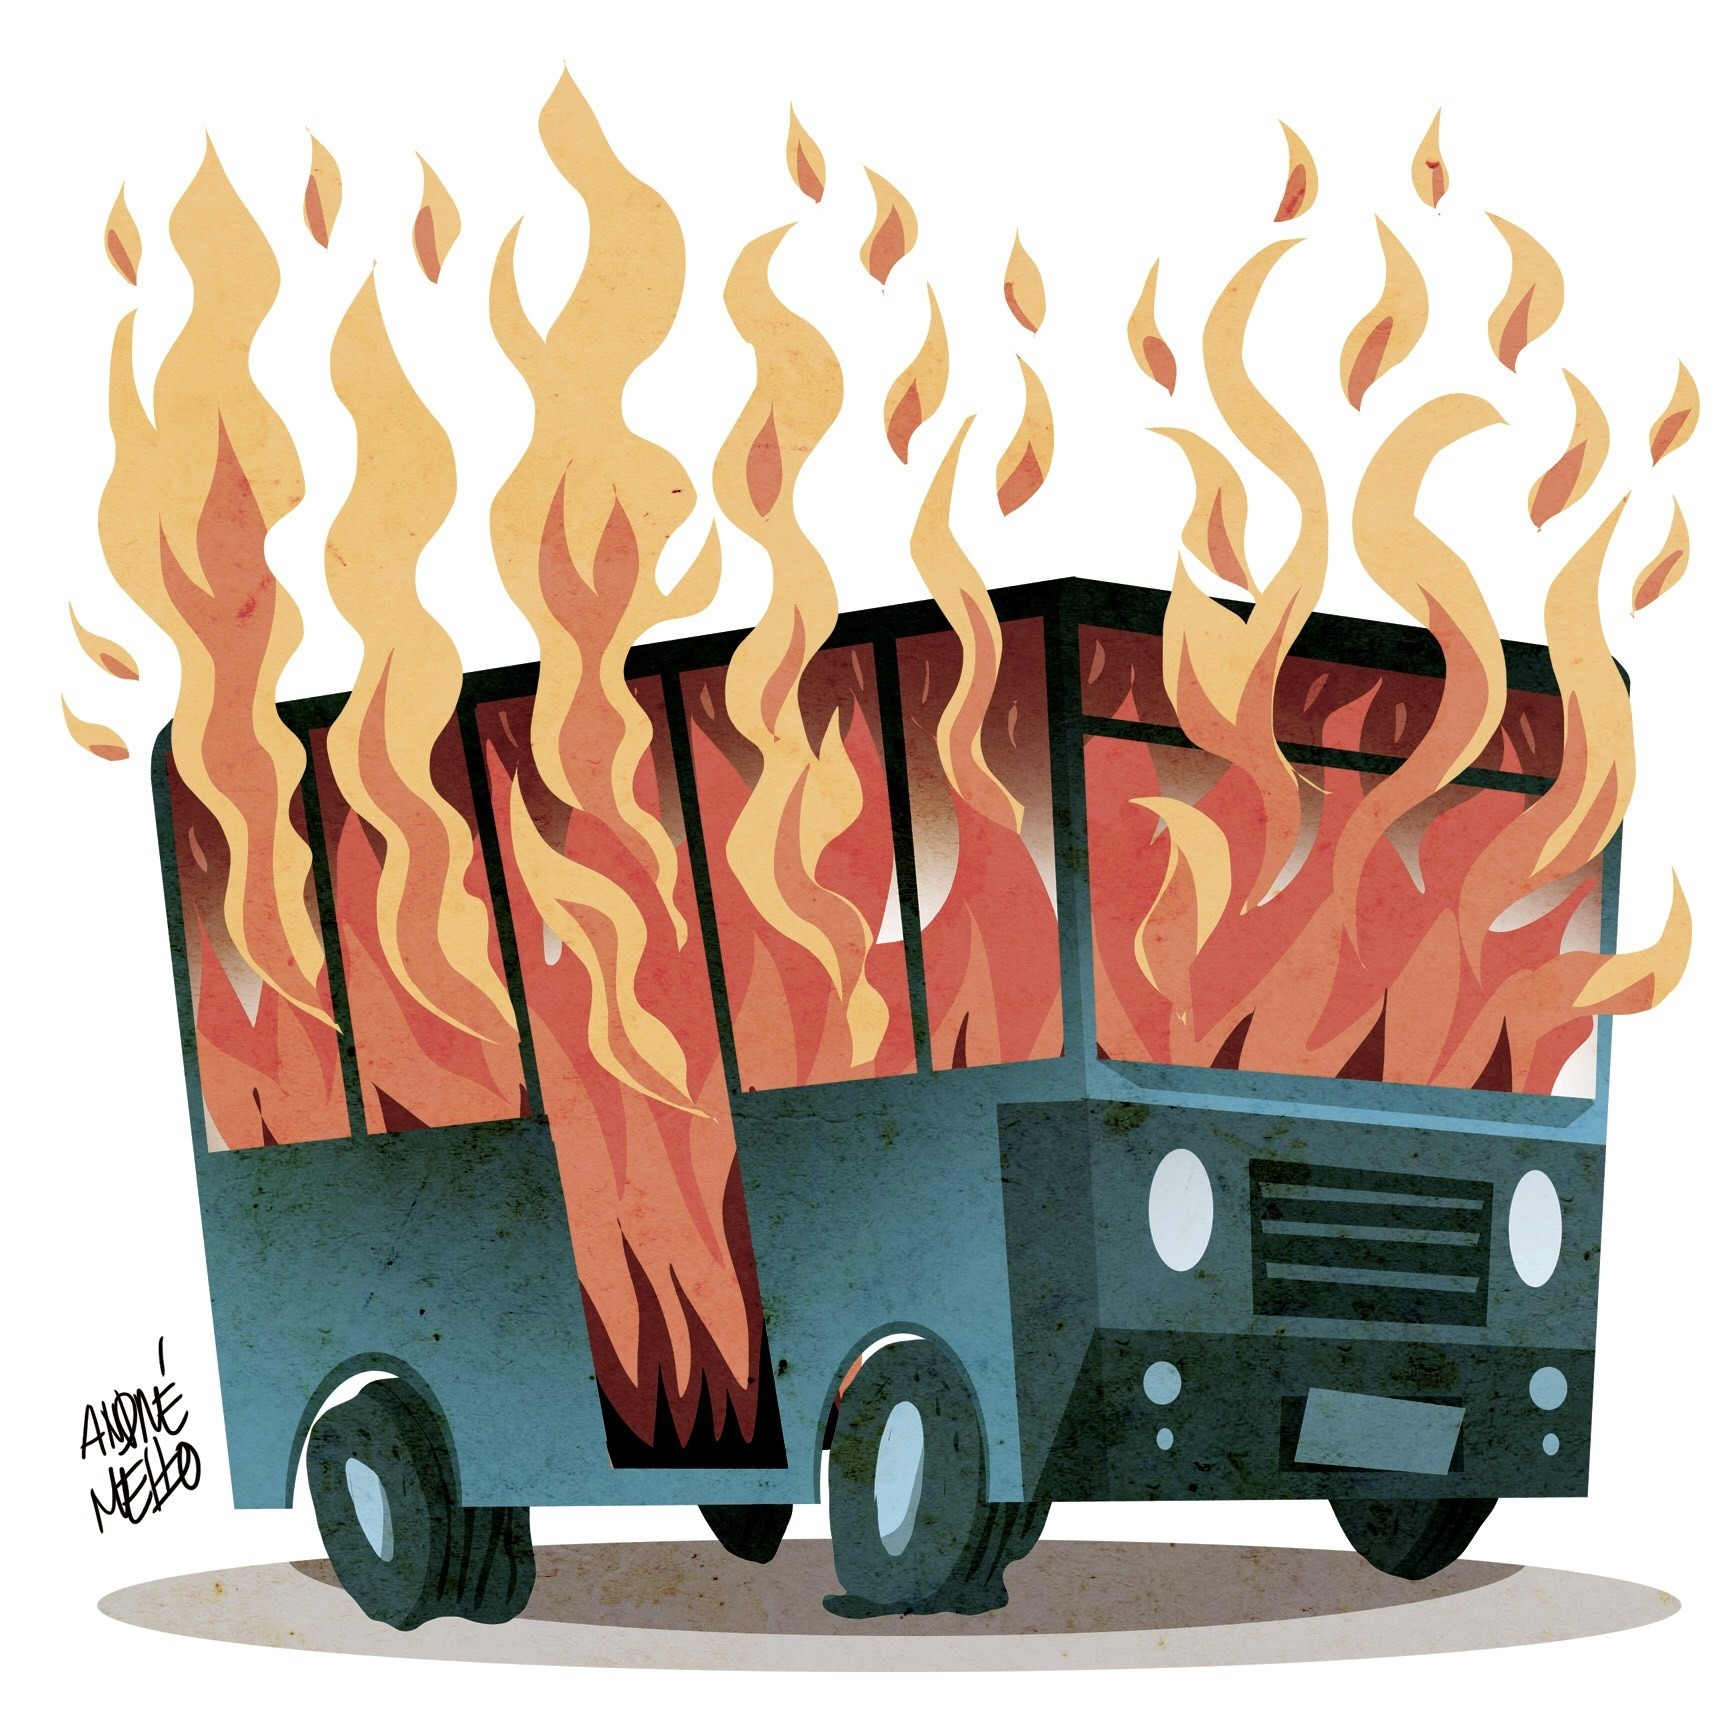 Ônibus em chamas